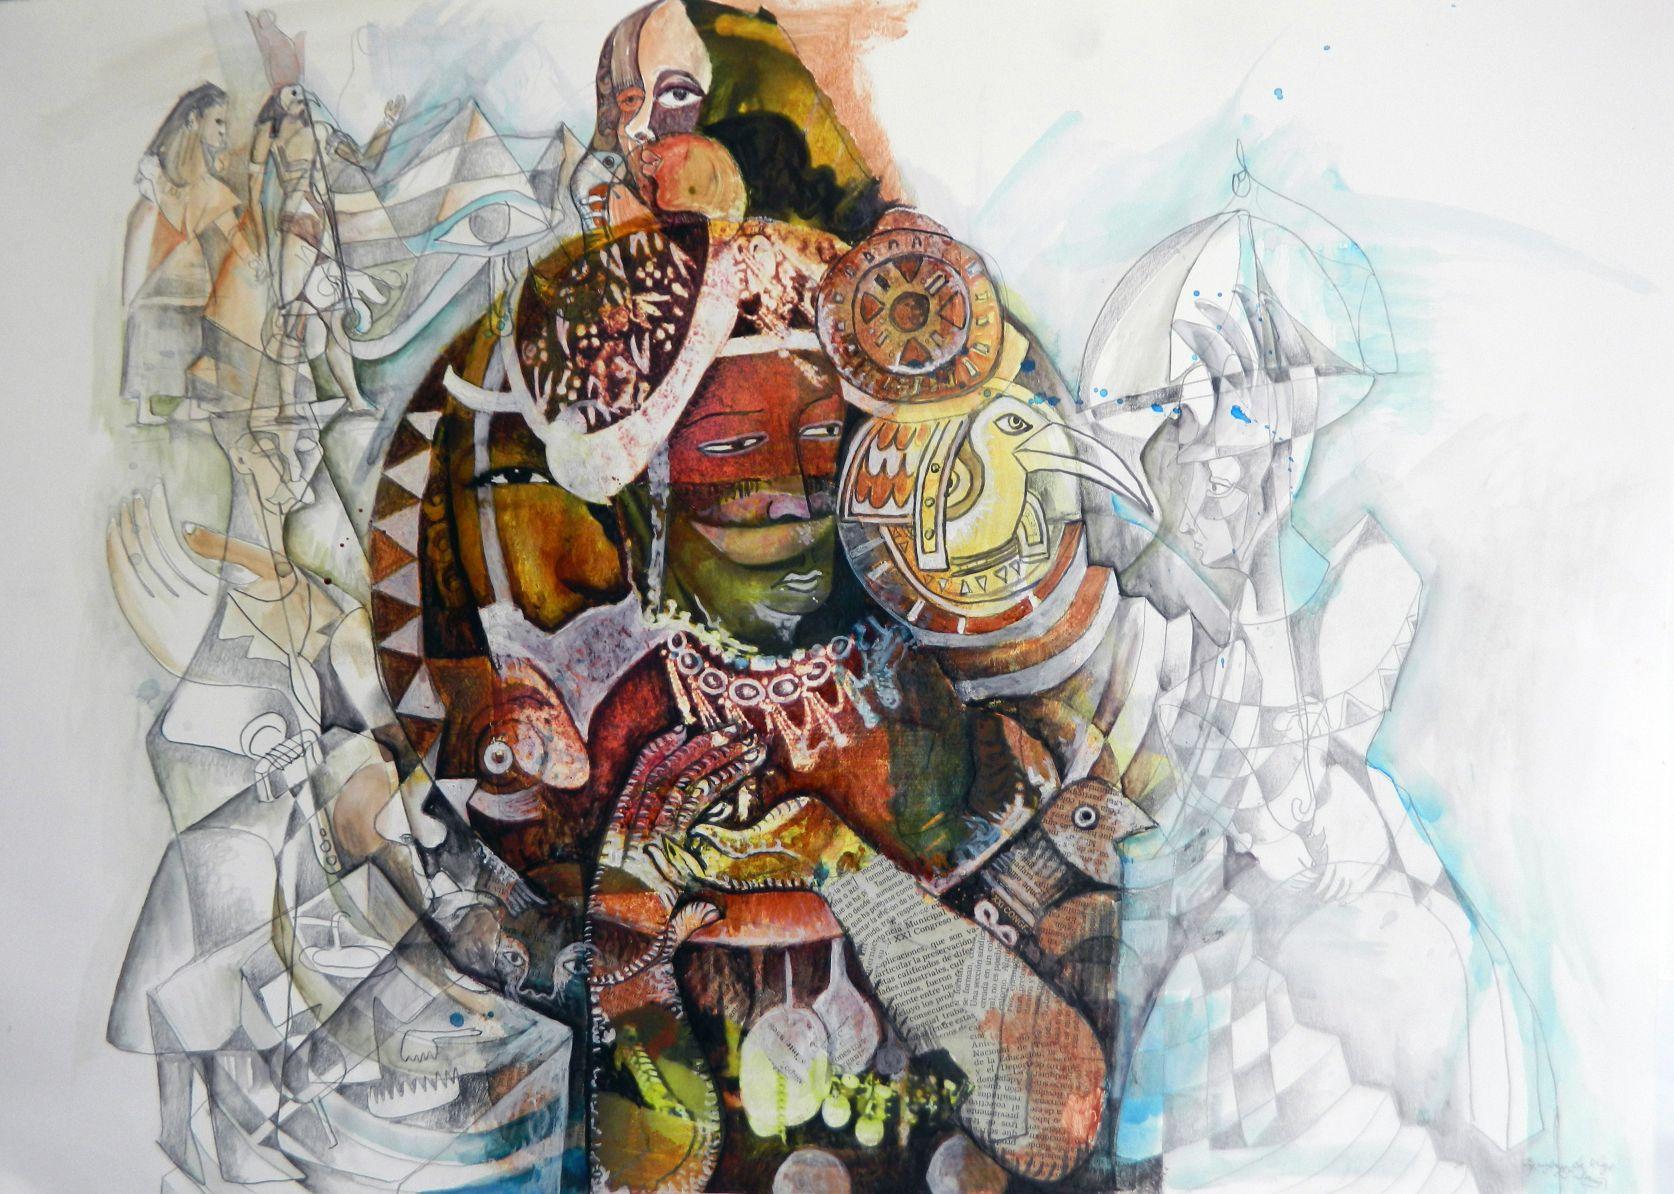 Equipaje de viaje. Serie Saramago, La Ceguera (2020) - Felipe Alarcón Echenique